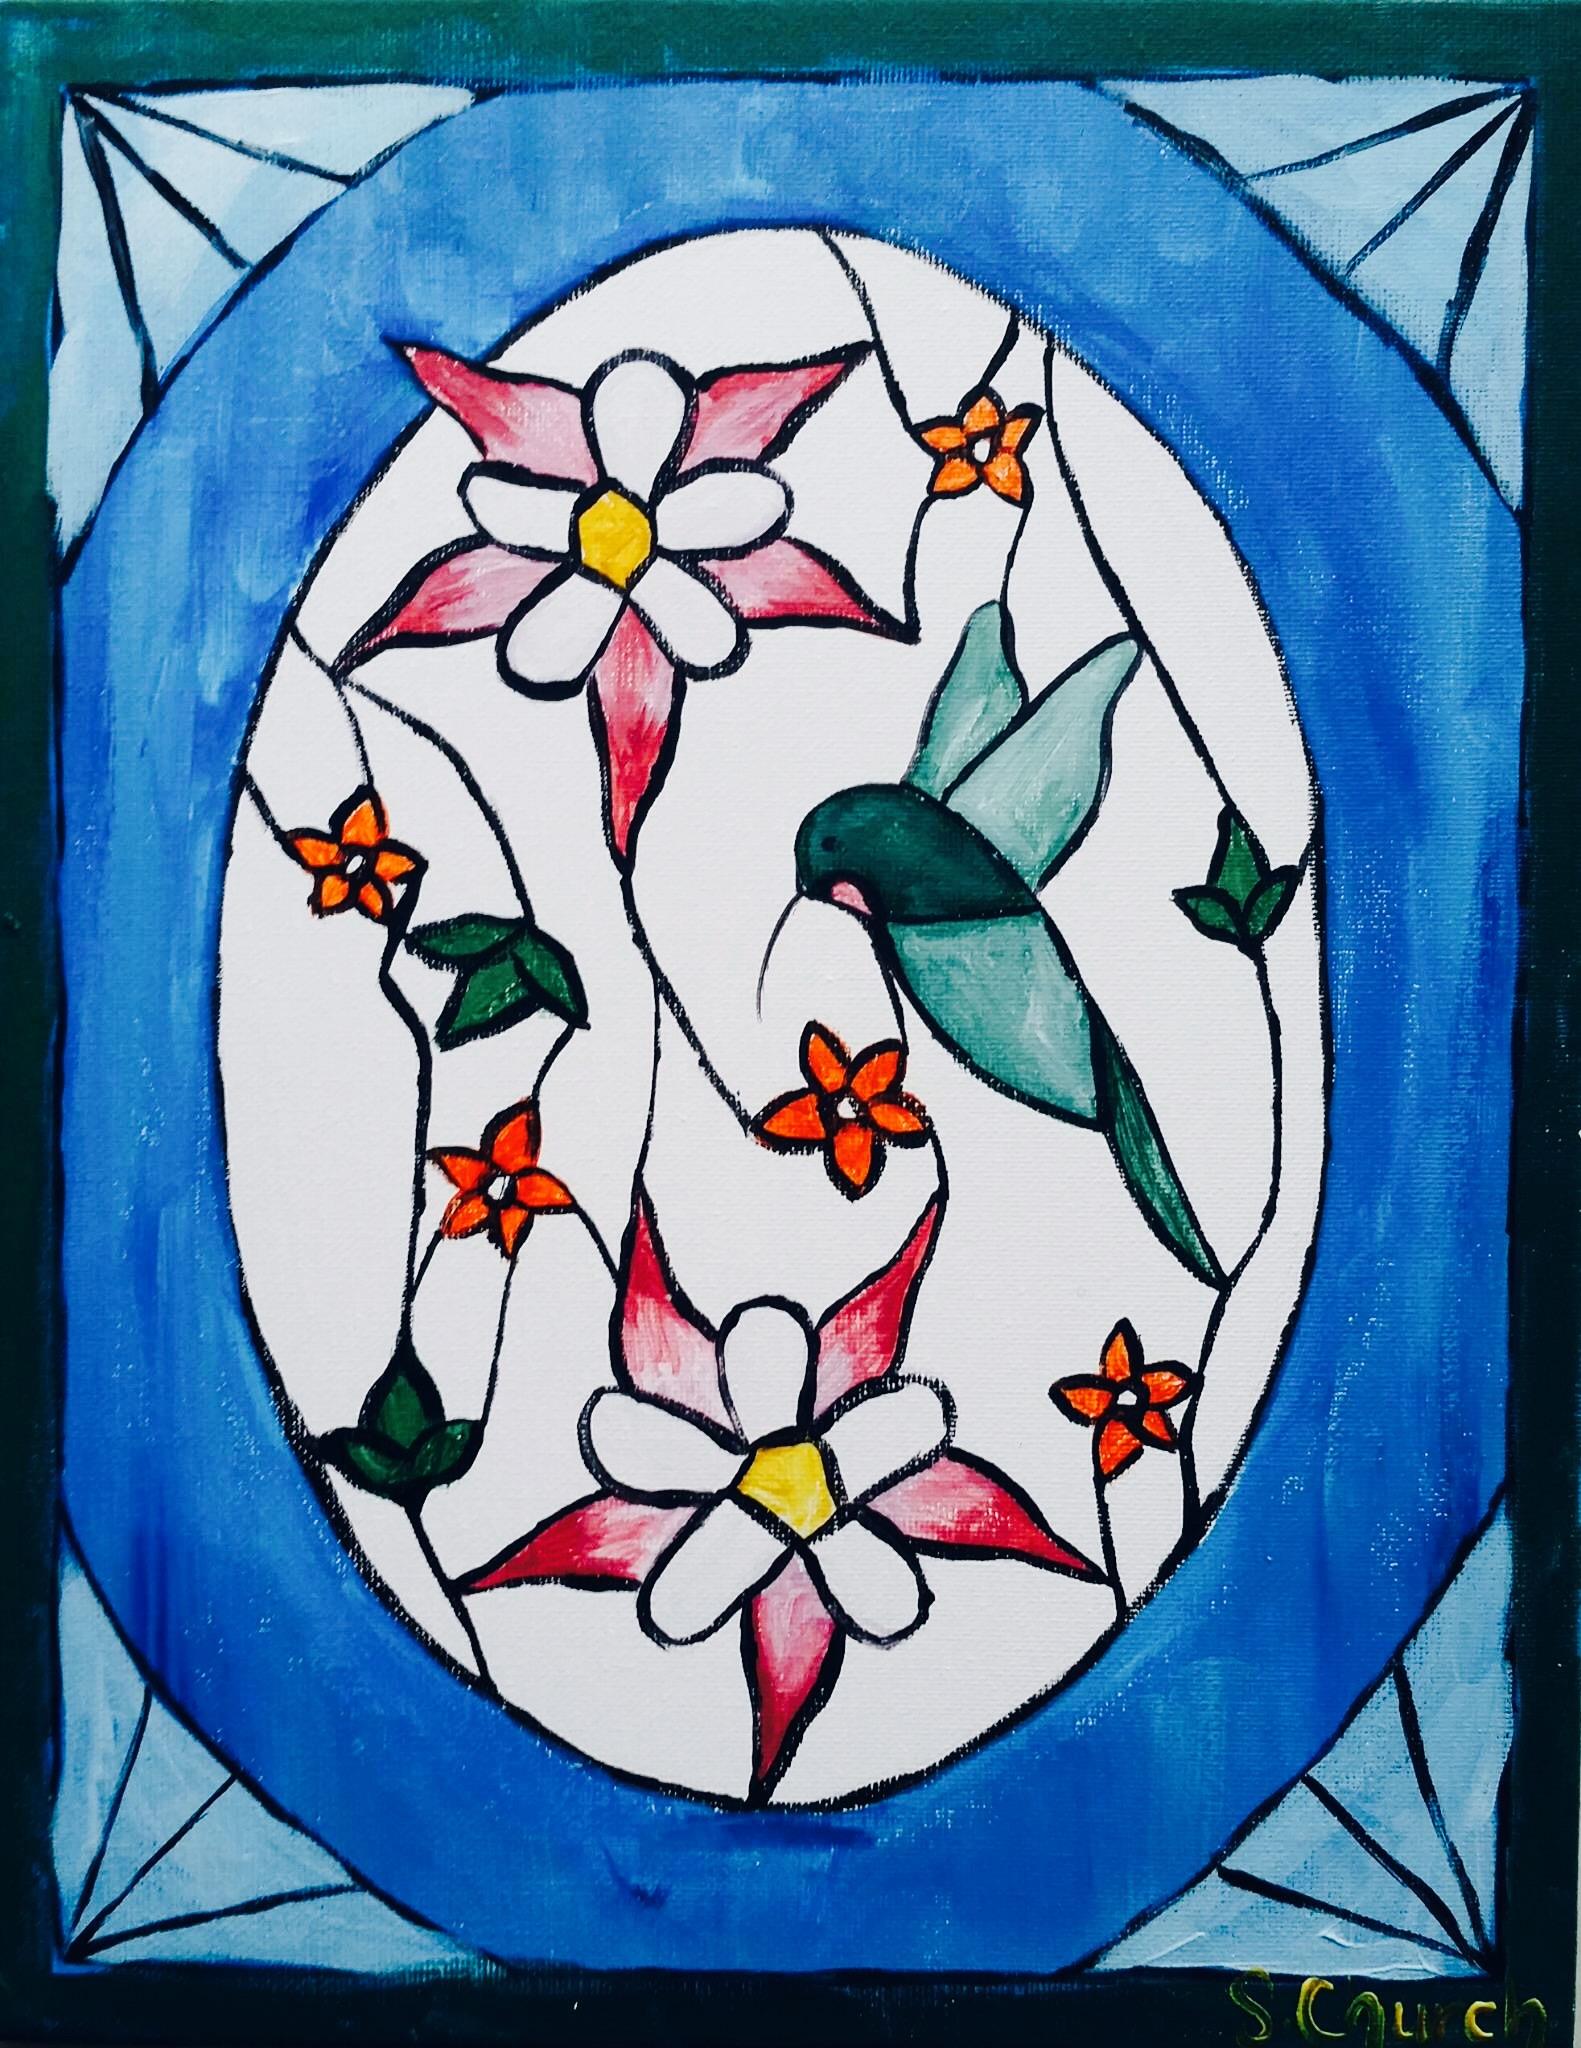 Stain glass Hummingbird